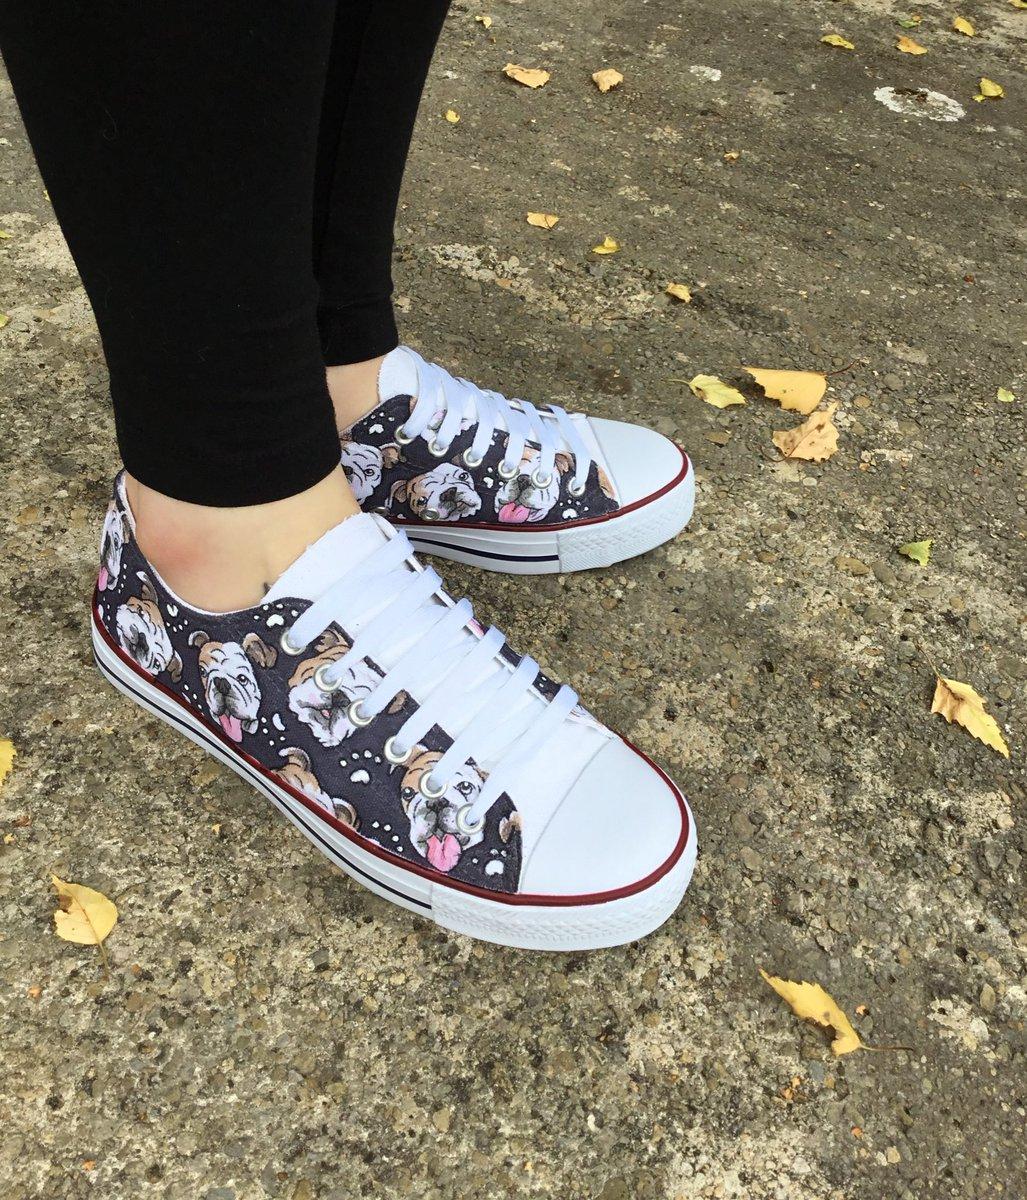 More custom shoes. Get your own pair from my Etsy shop.  http:// gemsville.etsy.com  &nbsp;   #custom #shoes #shoeart #pet #portrait #dogs #illustration<br>http://pic.twitter.com/xXBEfMknjq